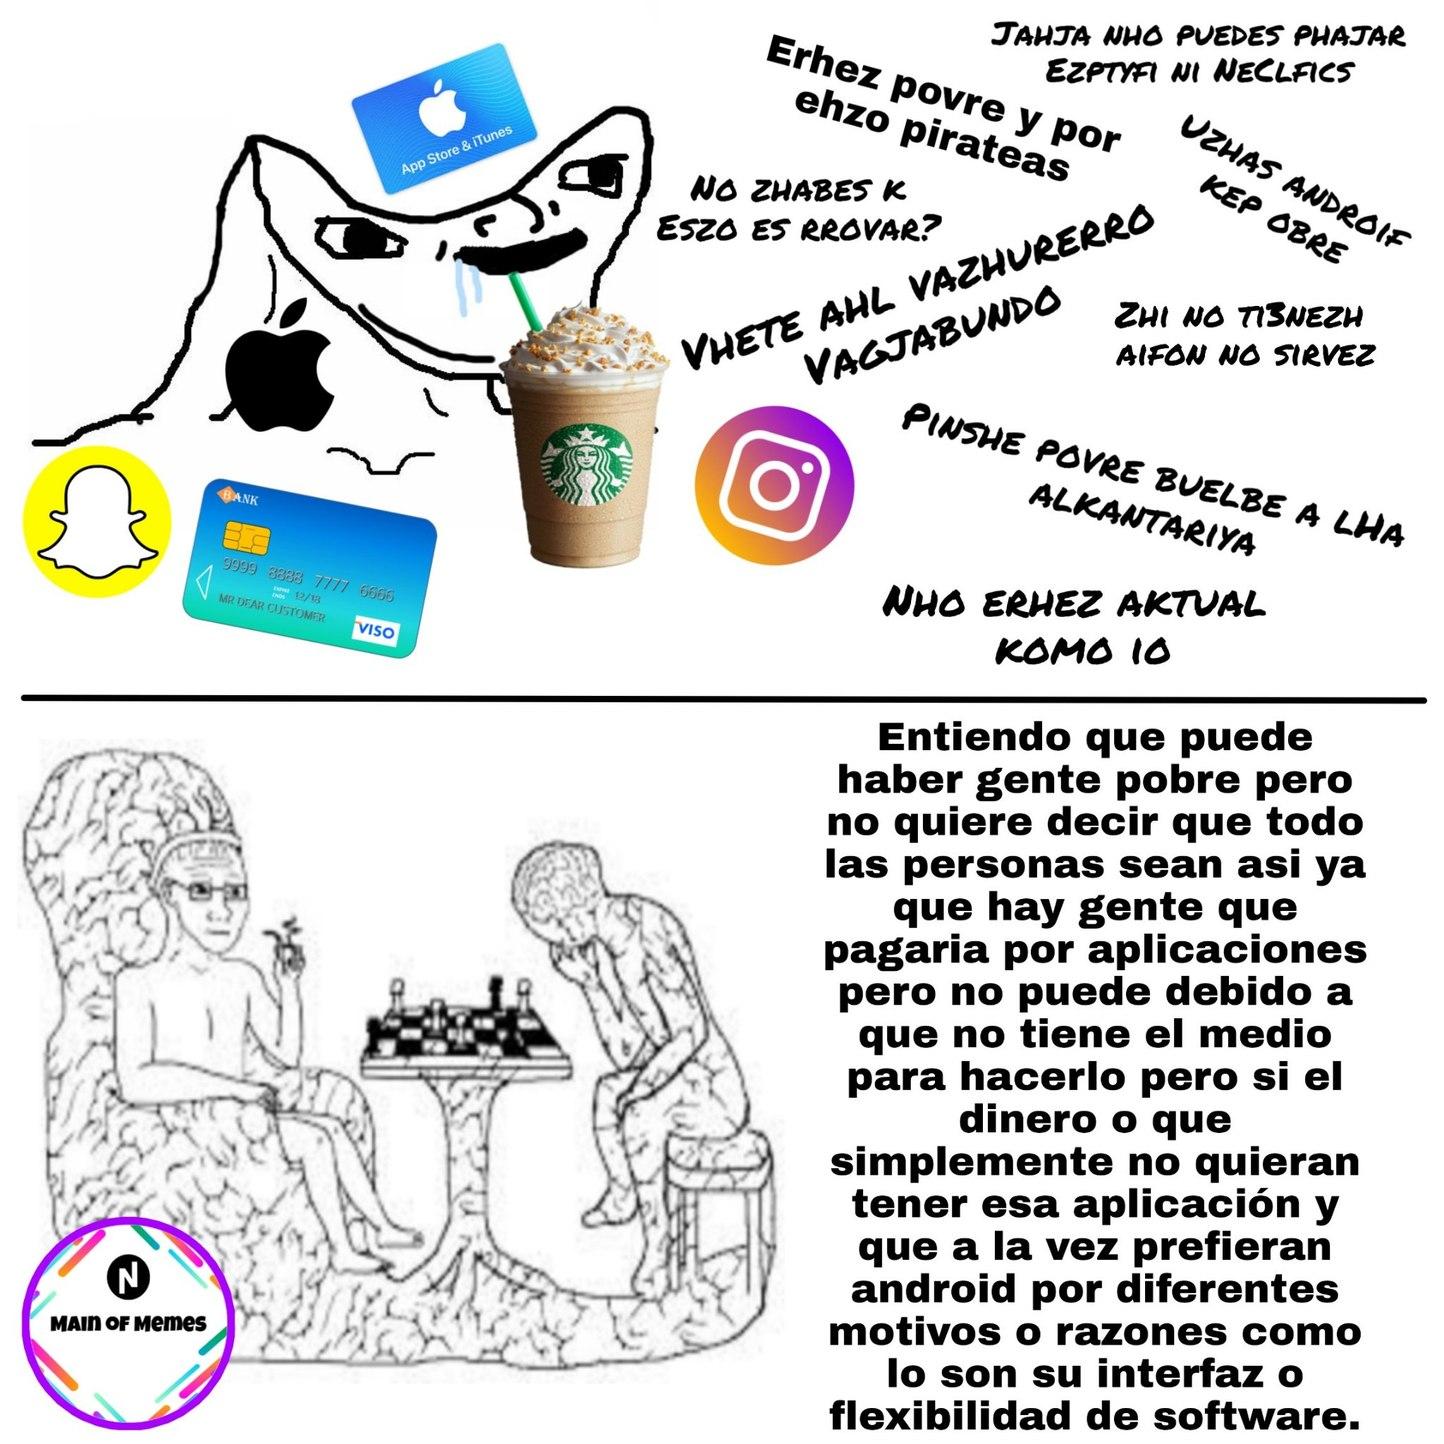 Ooohh shiiit a hipster - meme